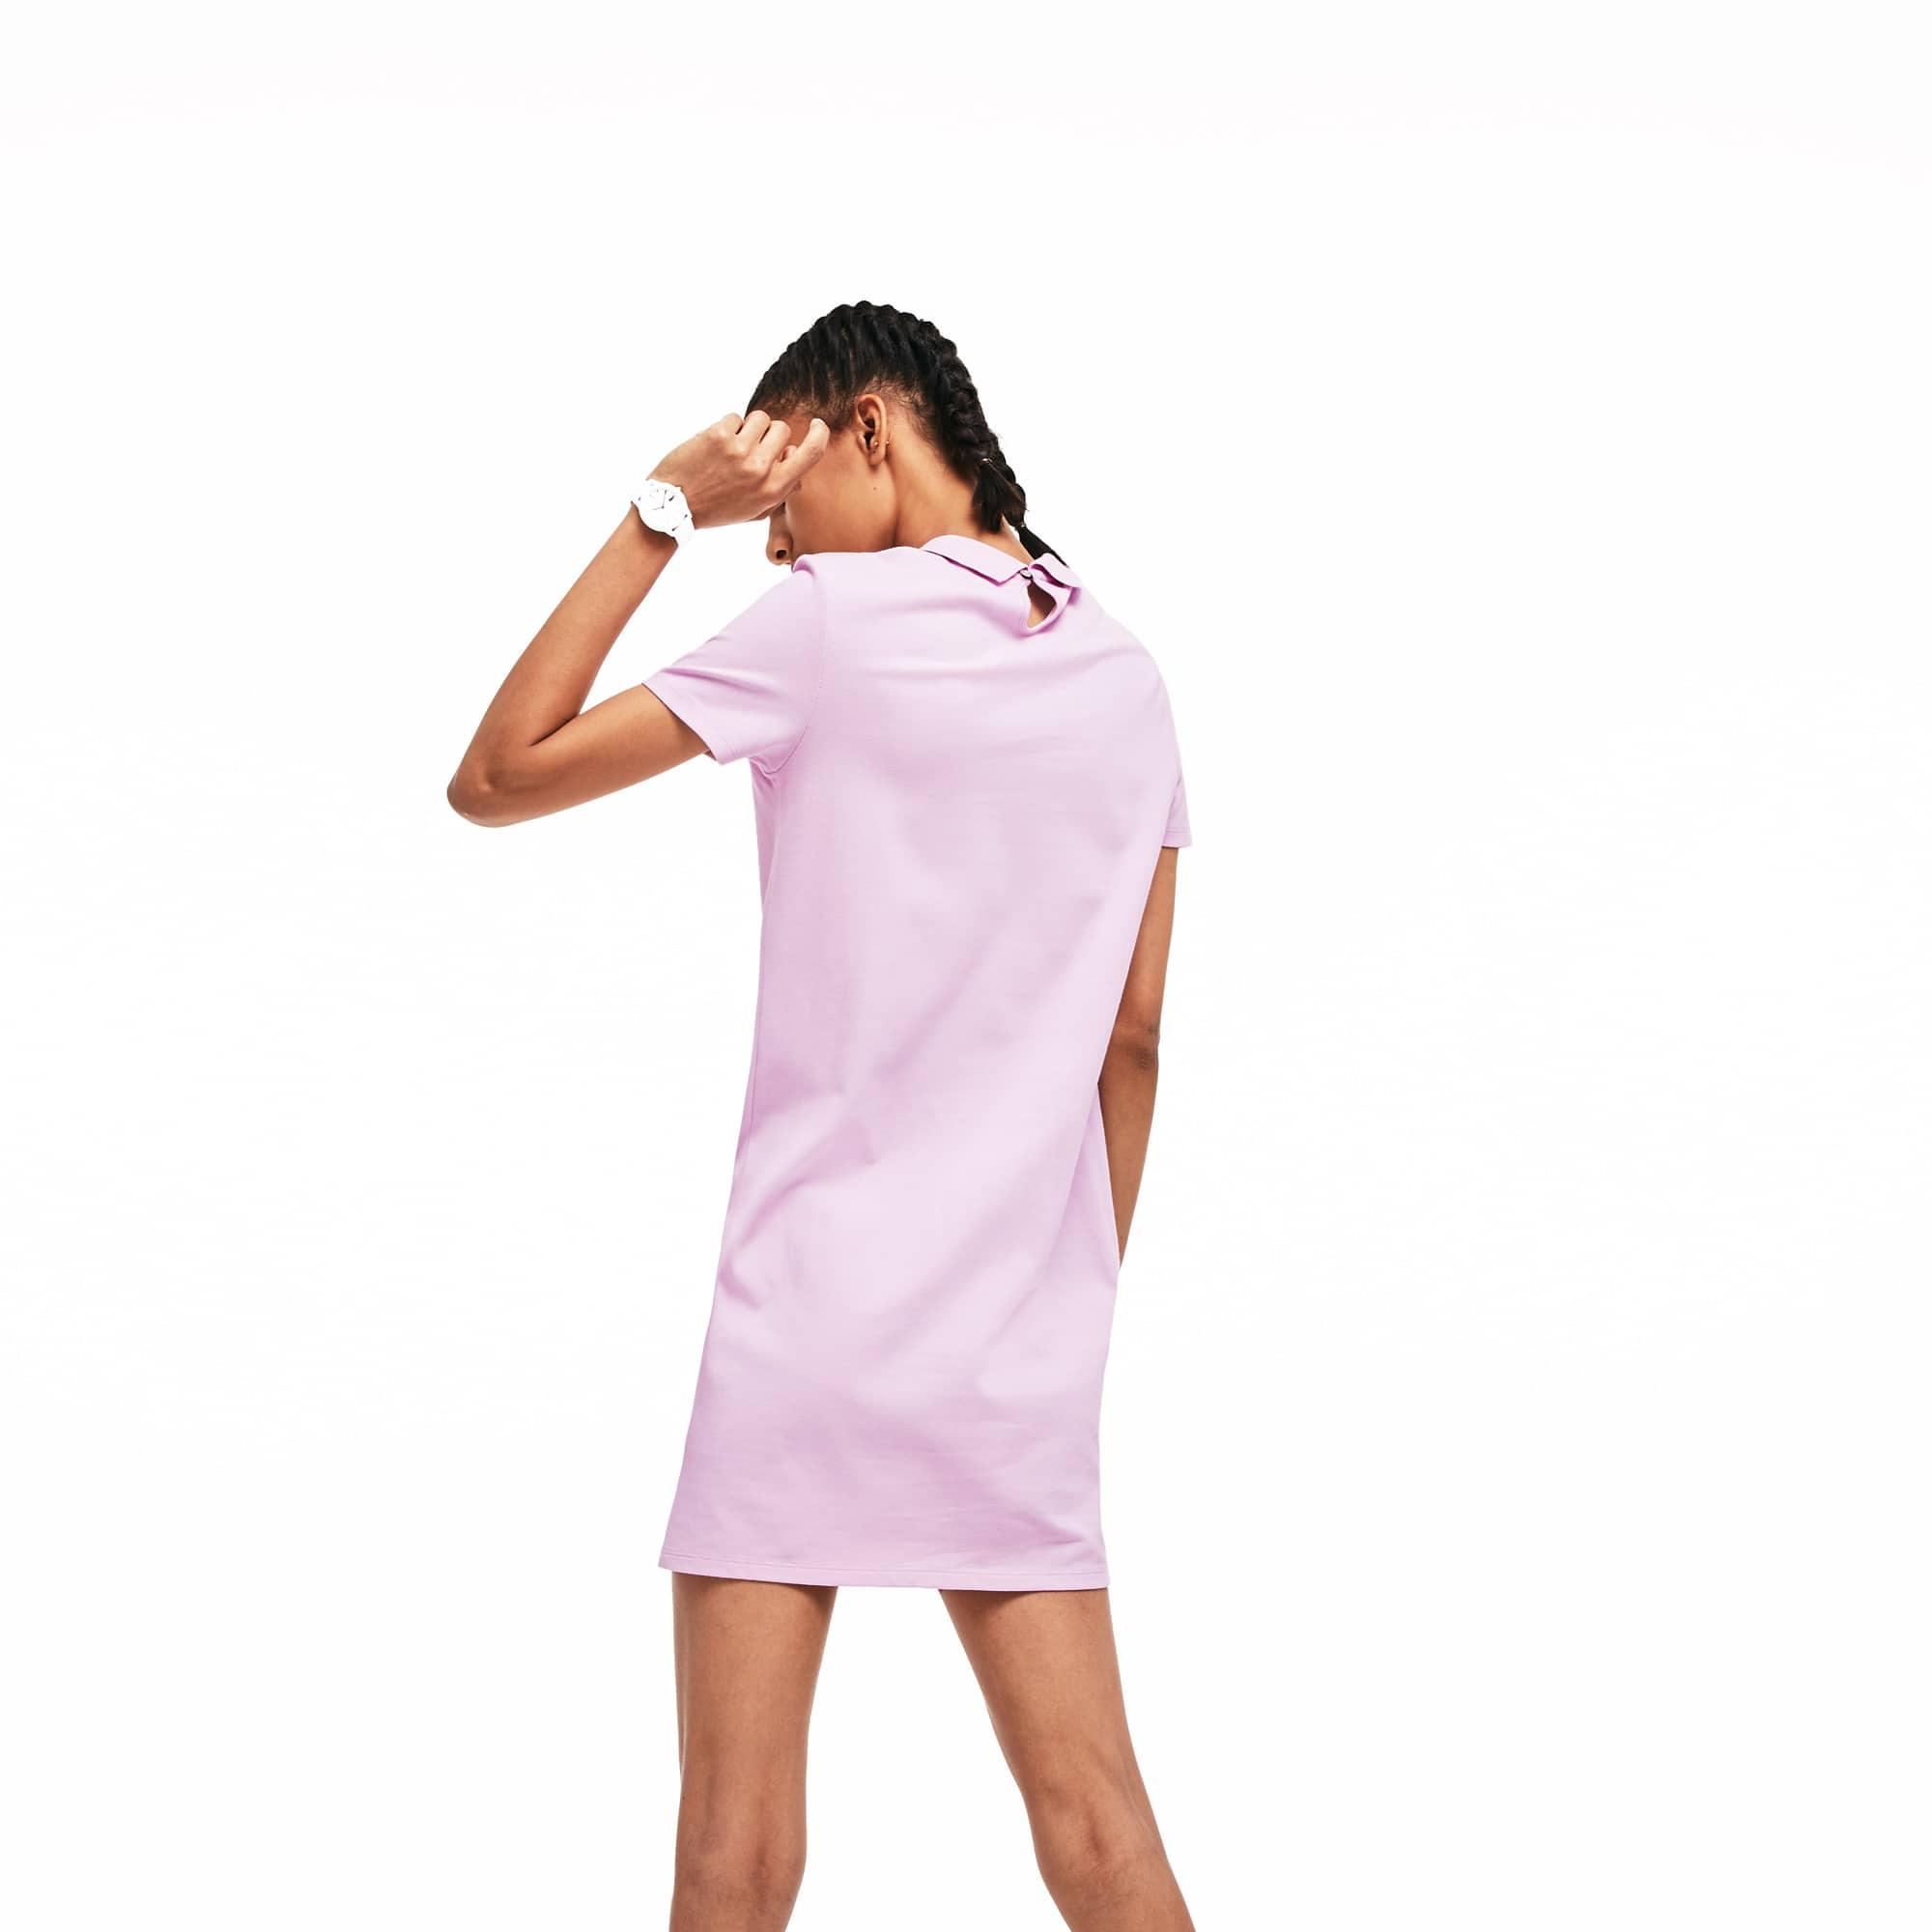 Ouverture Dos Avec Coton Robe En Live Polo Lacoste Stretch Au VMUSzpLqG